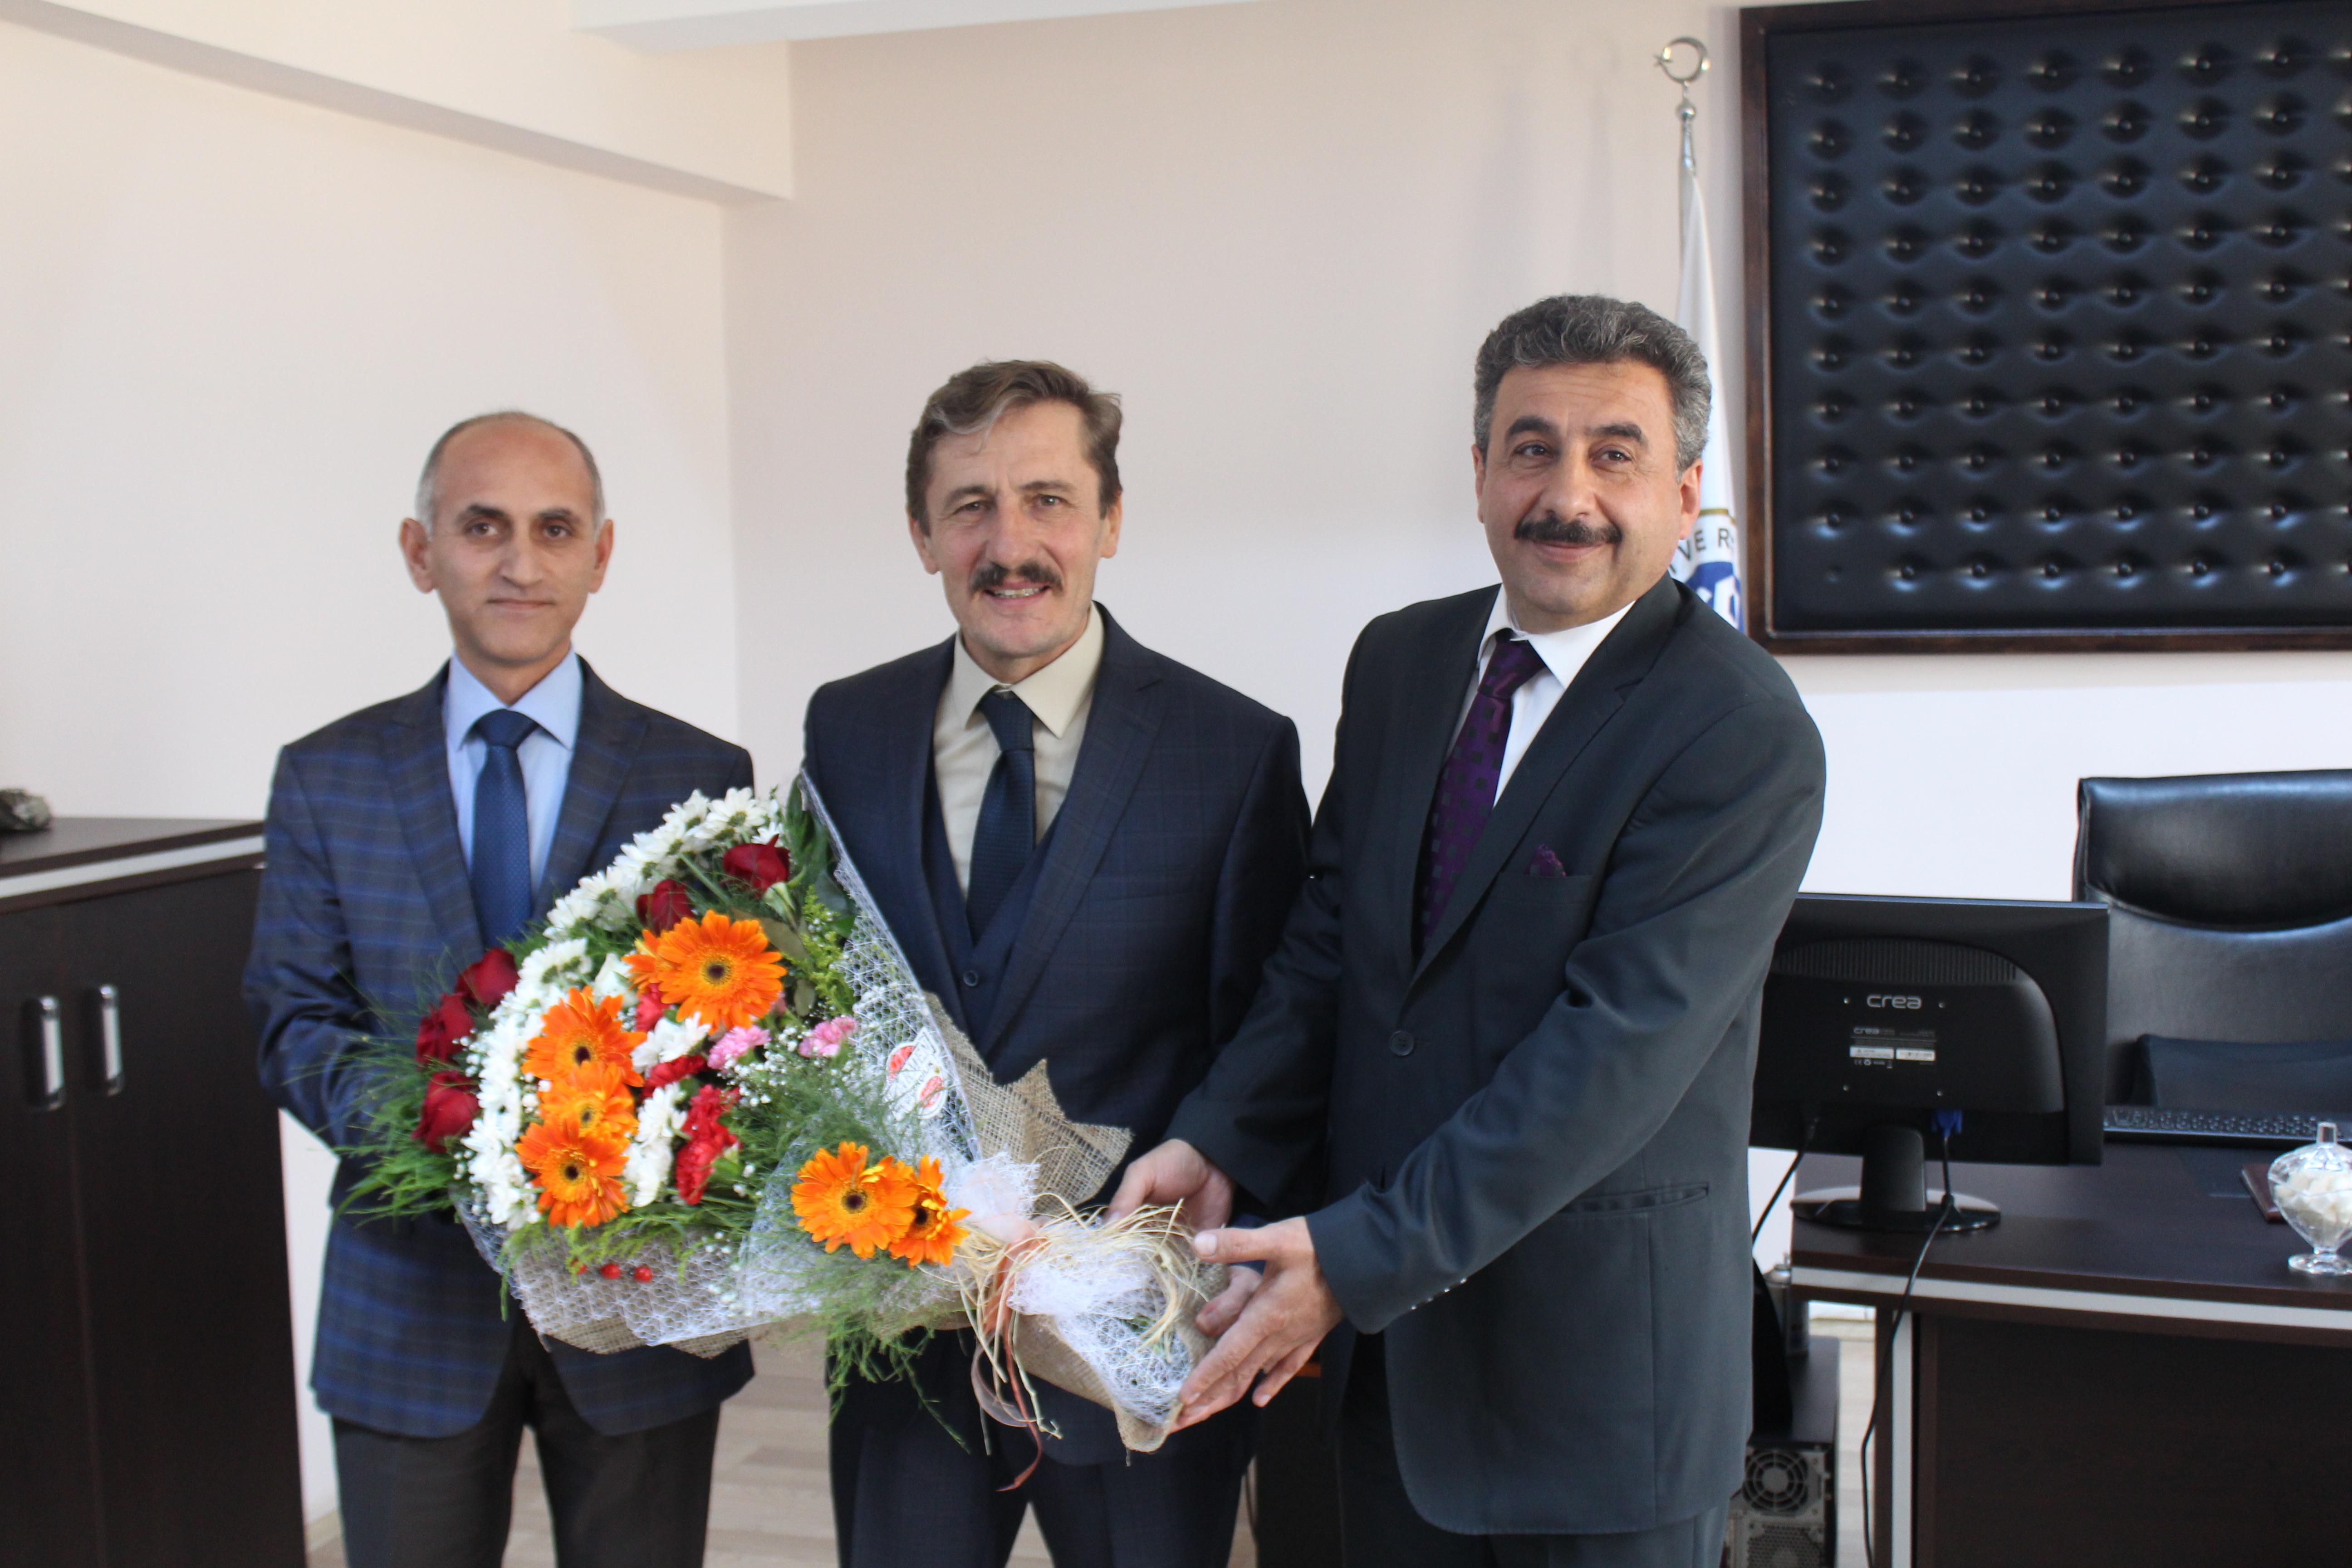 Handover Ceremony at Tercan Vocational High School